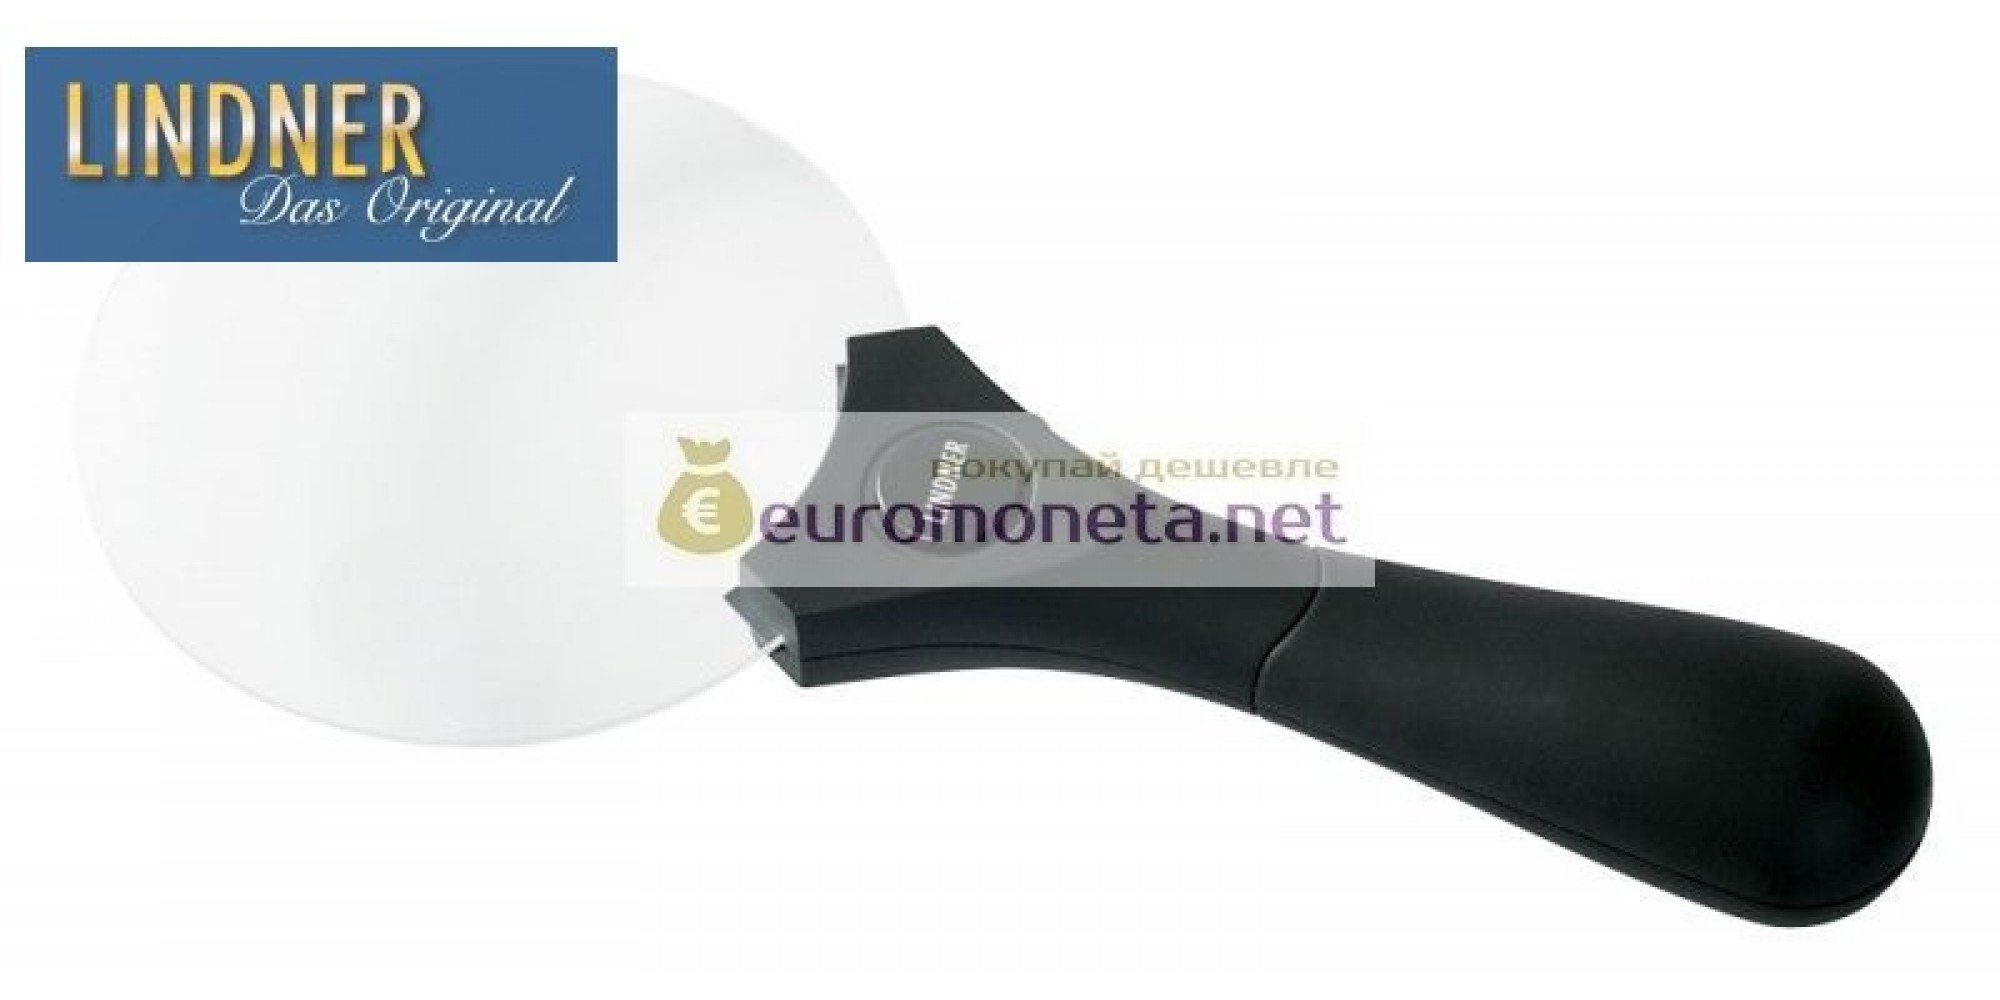 Лупа Lindner с LED подсветкой увеличение 2,5х / 4,5х диаметр линзы 110 мм